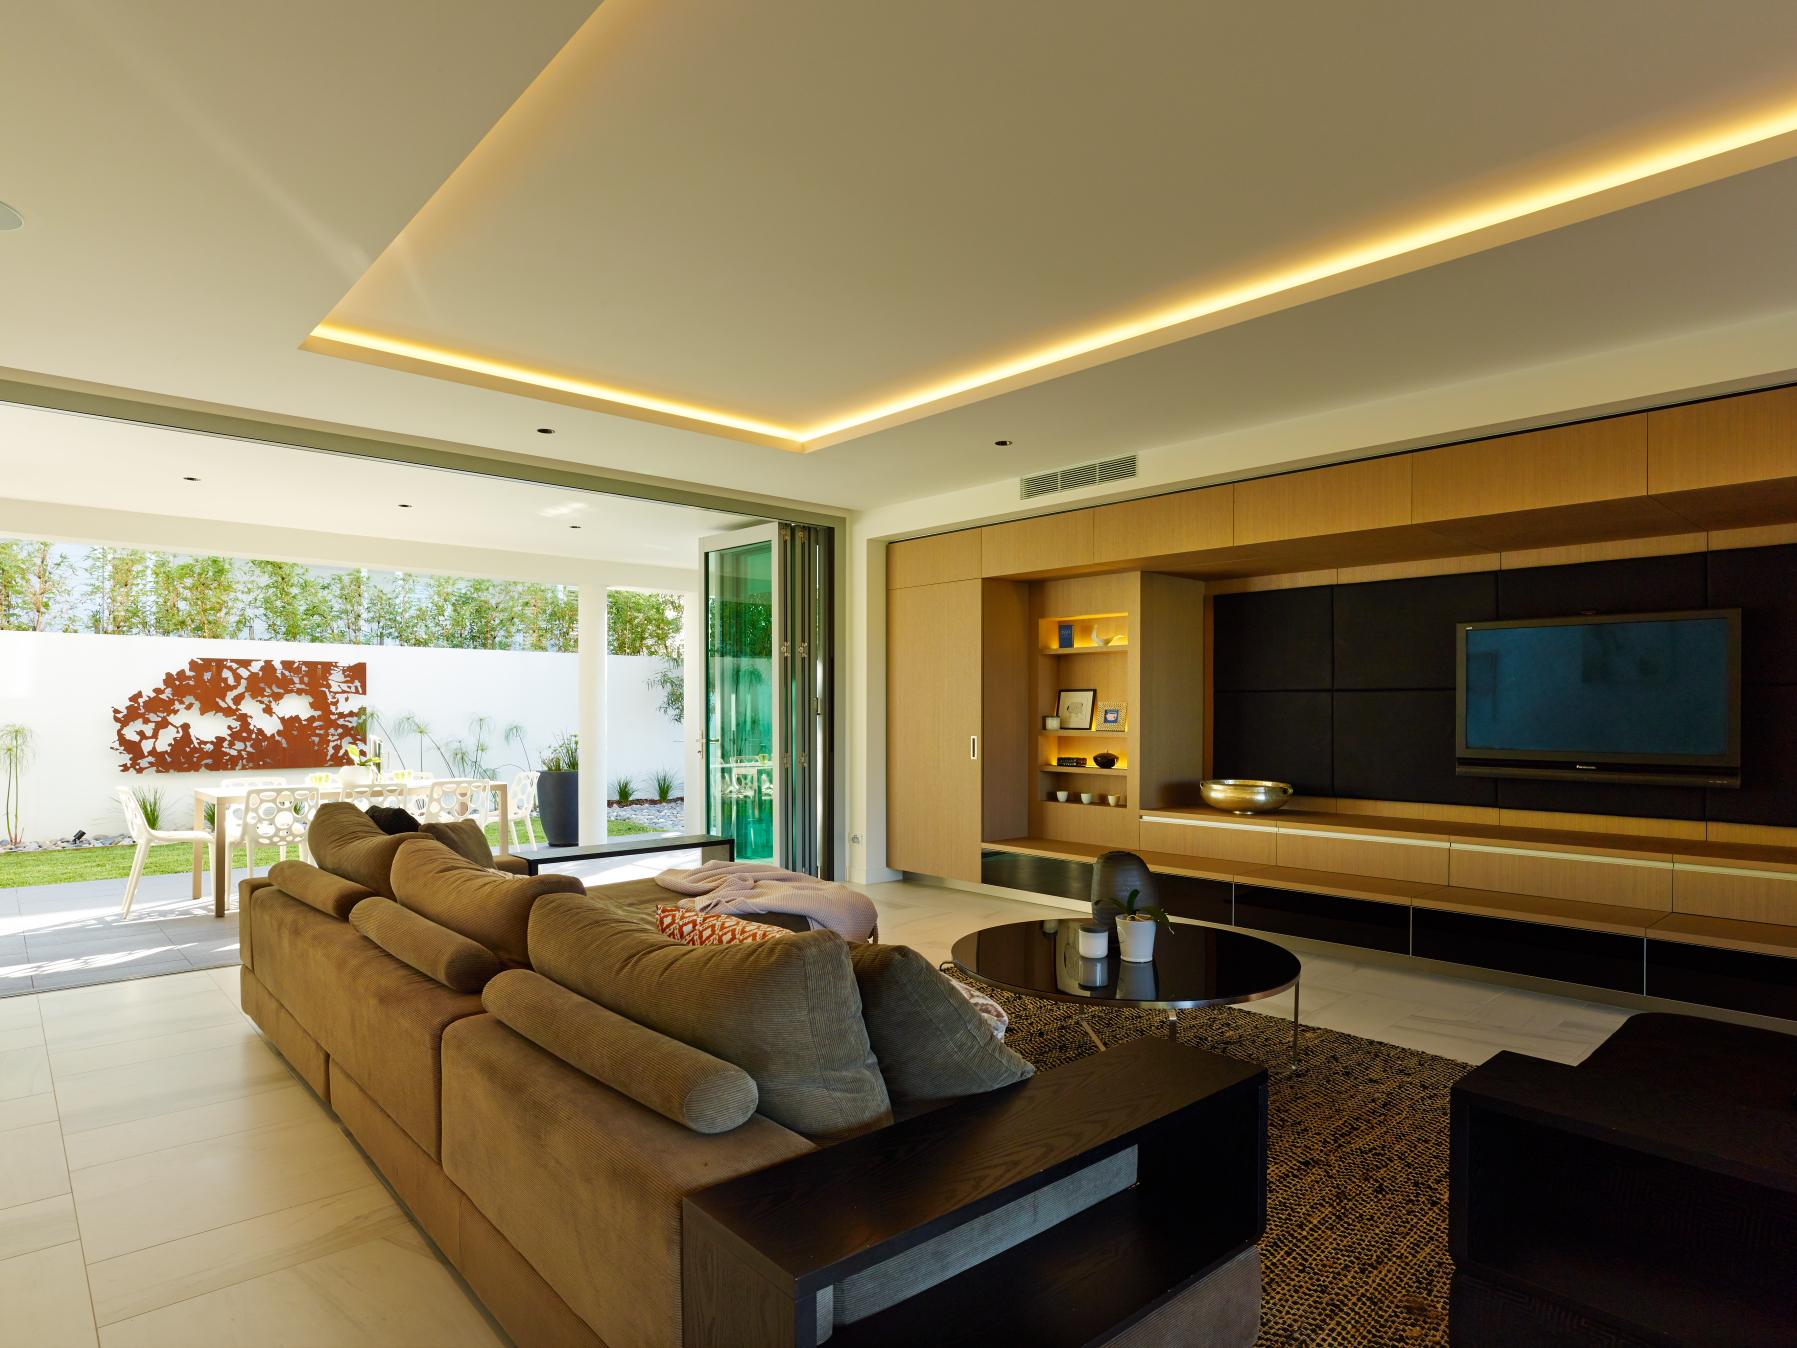 Hamilton Residence_010.JPG